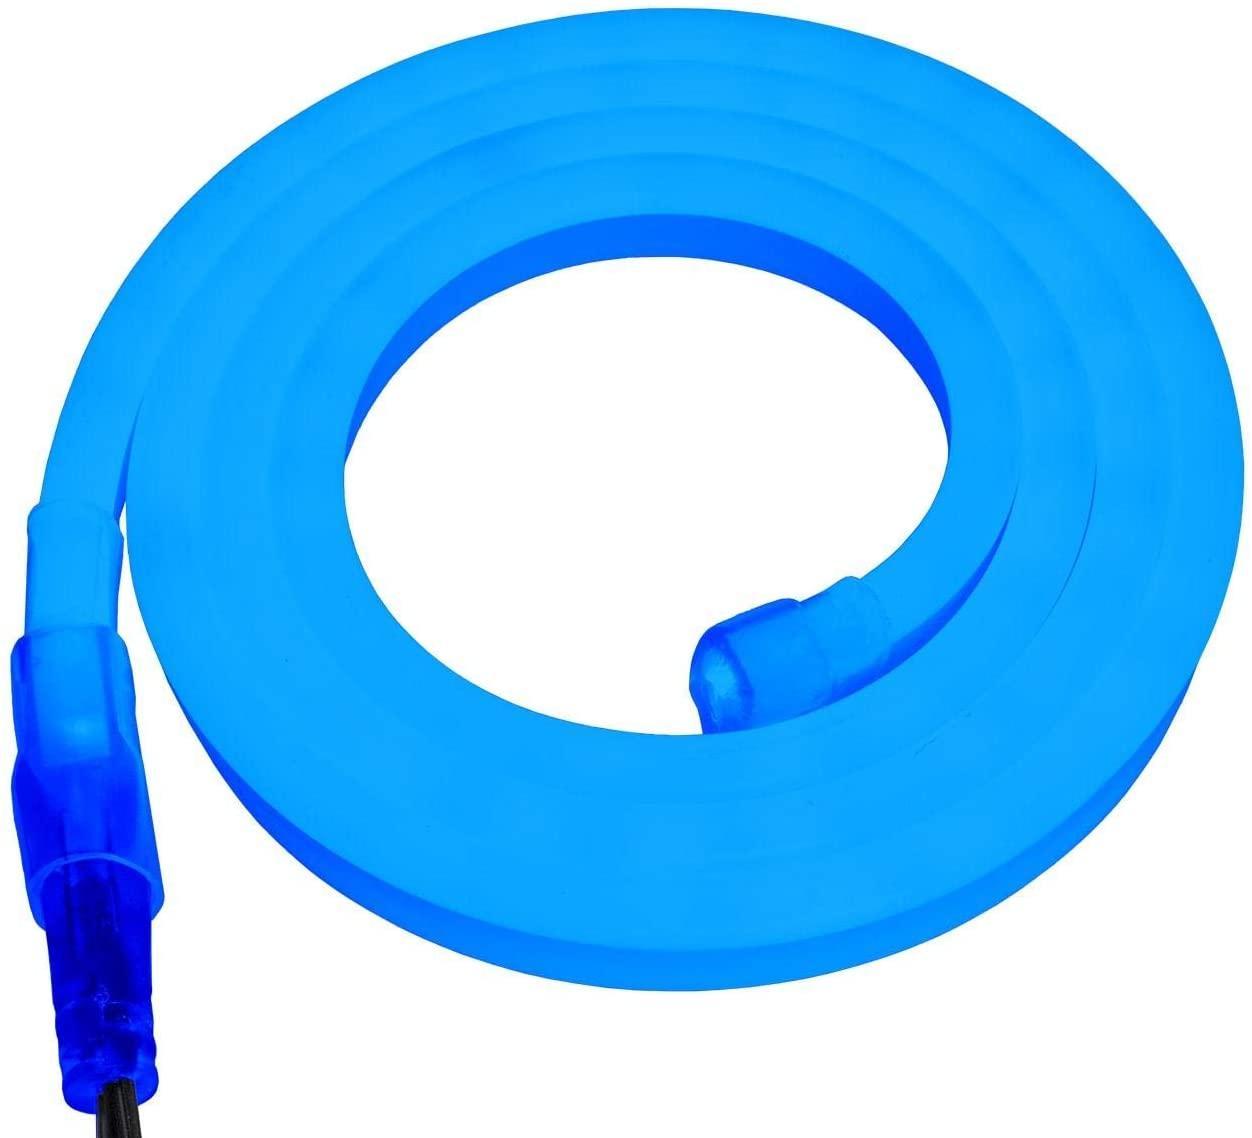 Brilliant Brand Lighting Blue SMD LED Neon Strip Light - 120 Volt - Custom Cut - 44.28 Feet